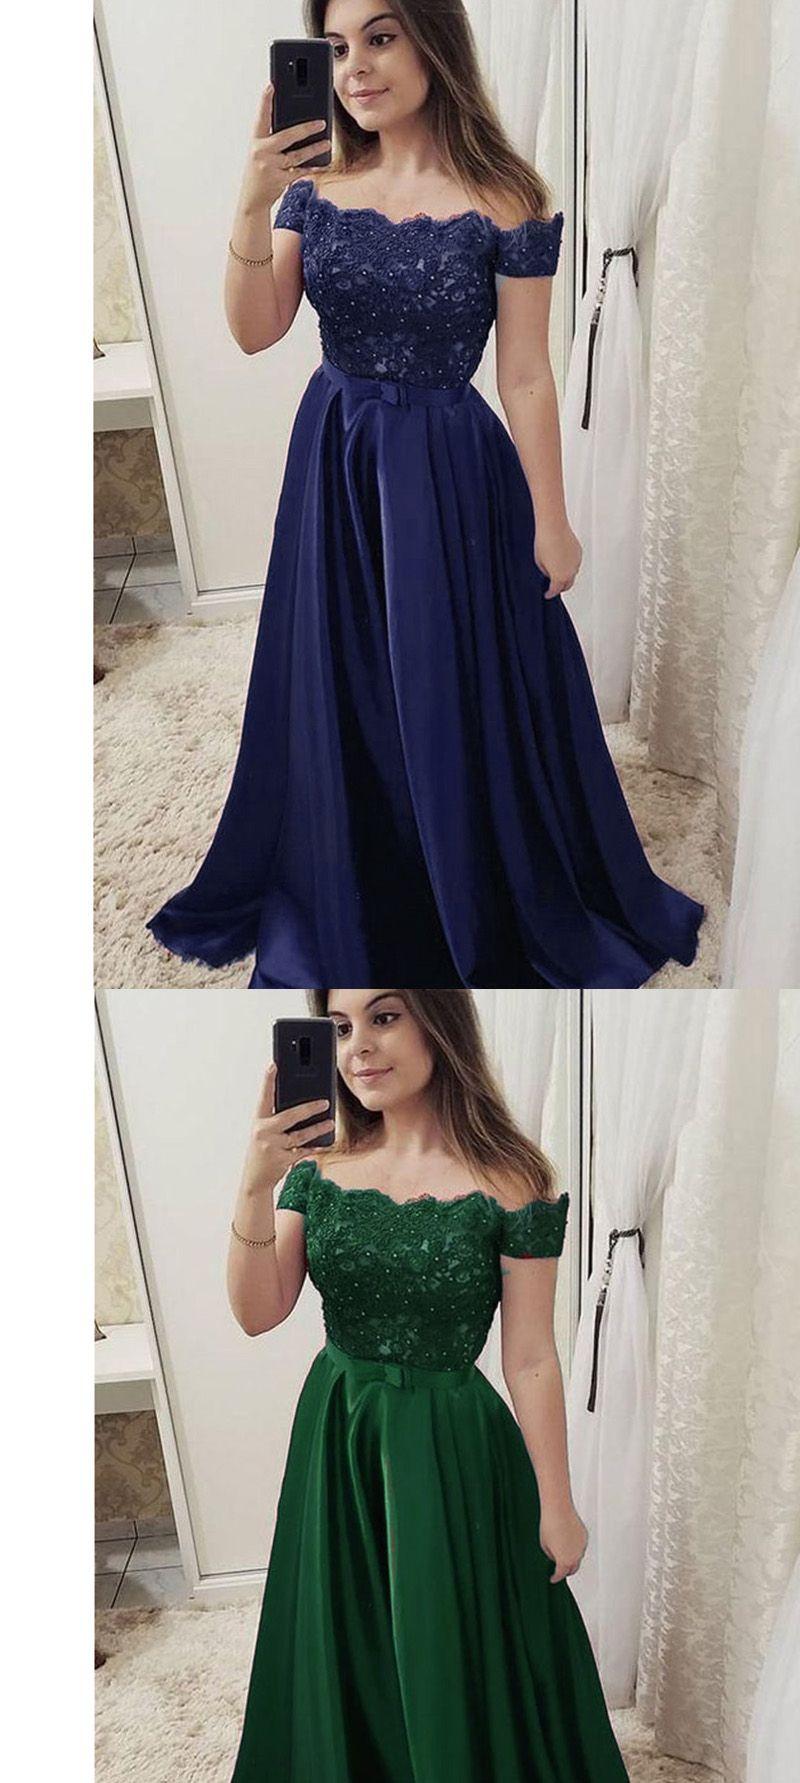 0742754e3 Navy /Green/Red Elegant Off Shoulder Prom Dresses Long Lace ...